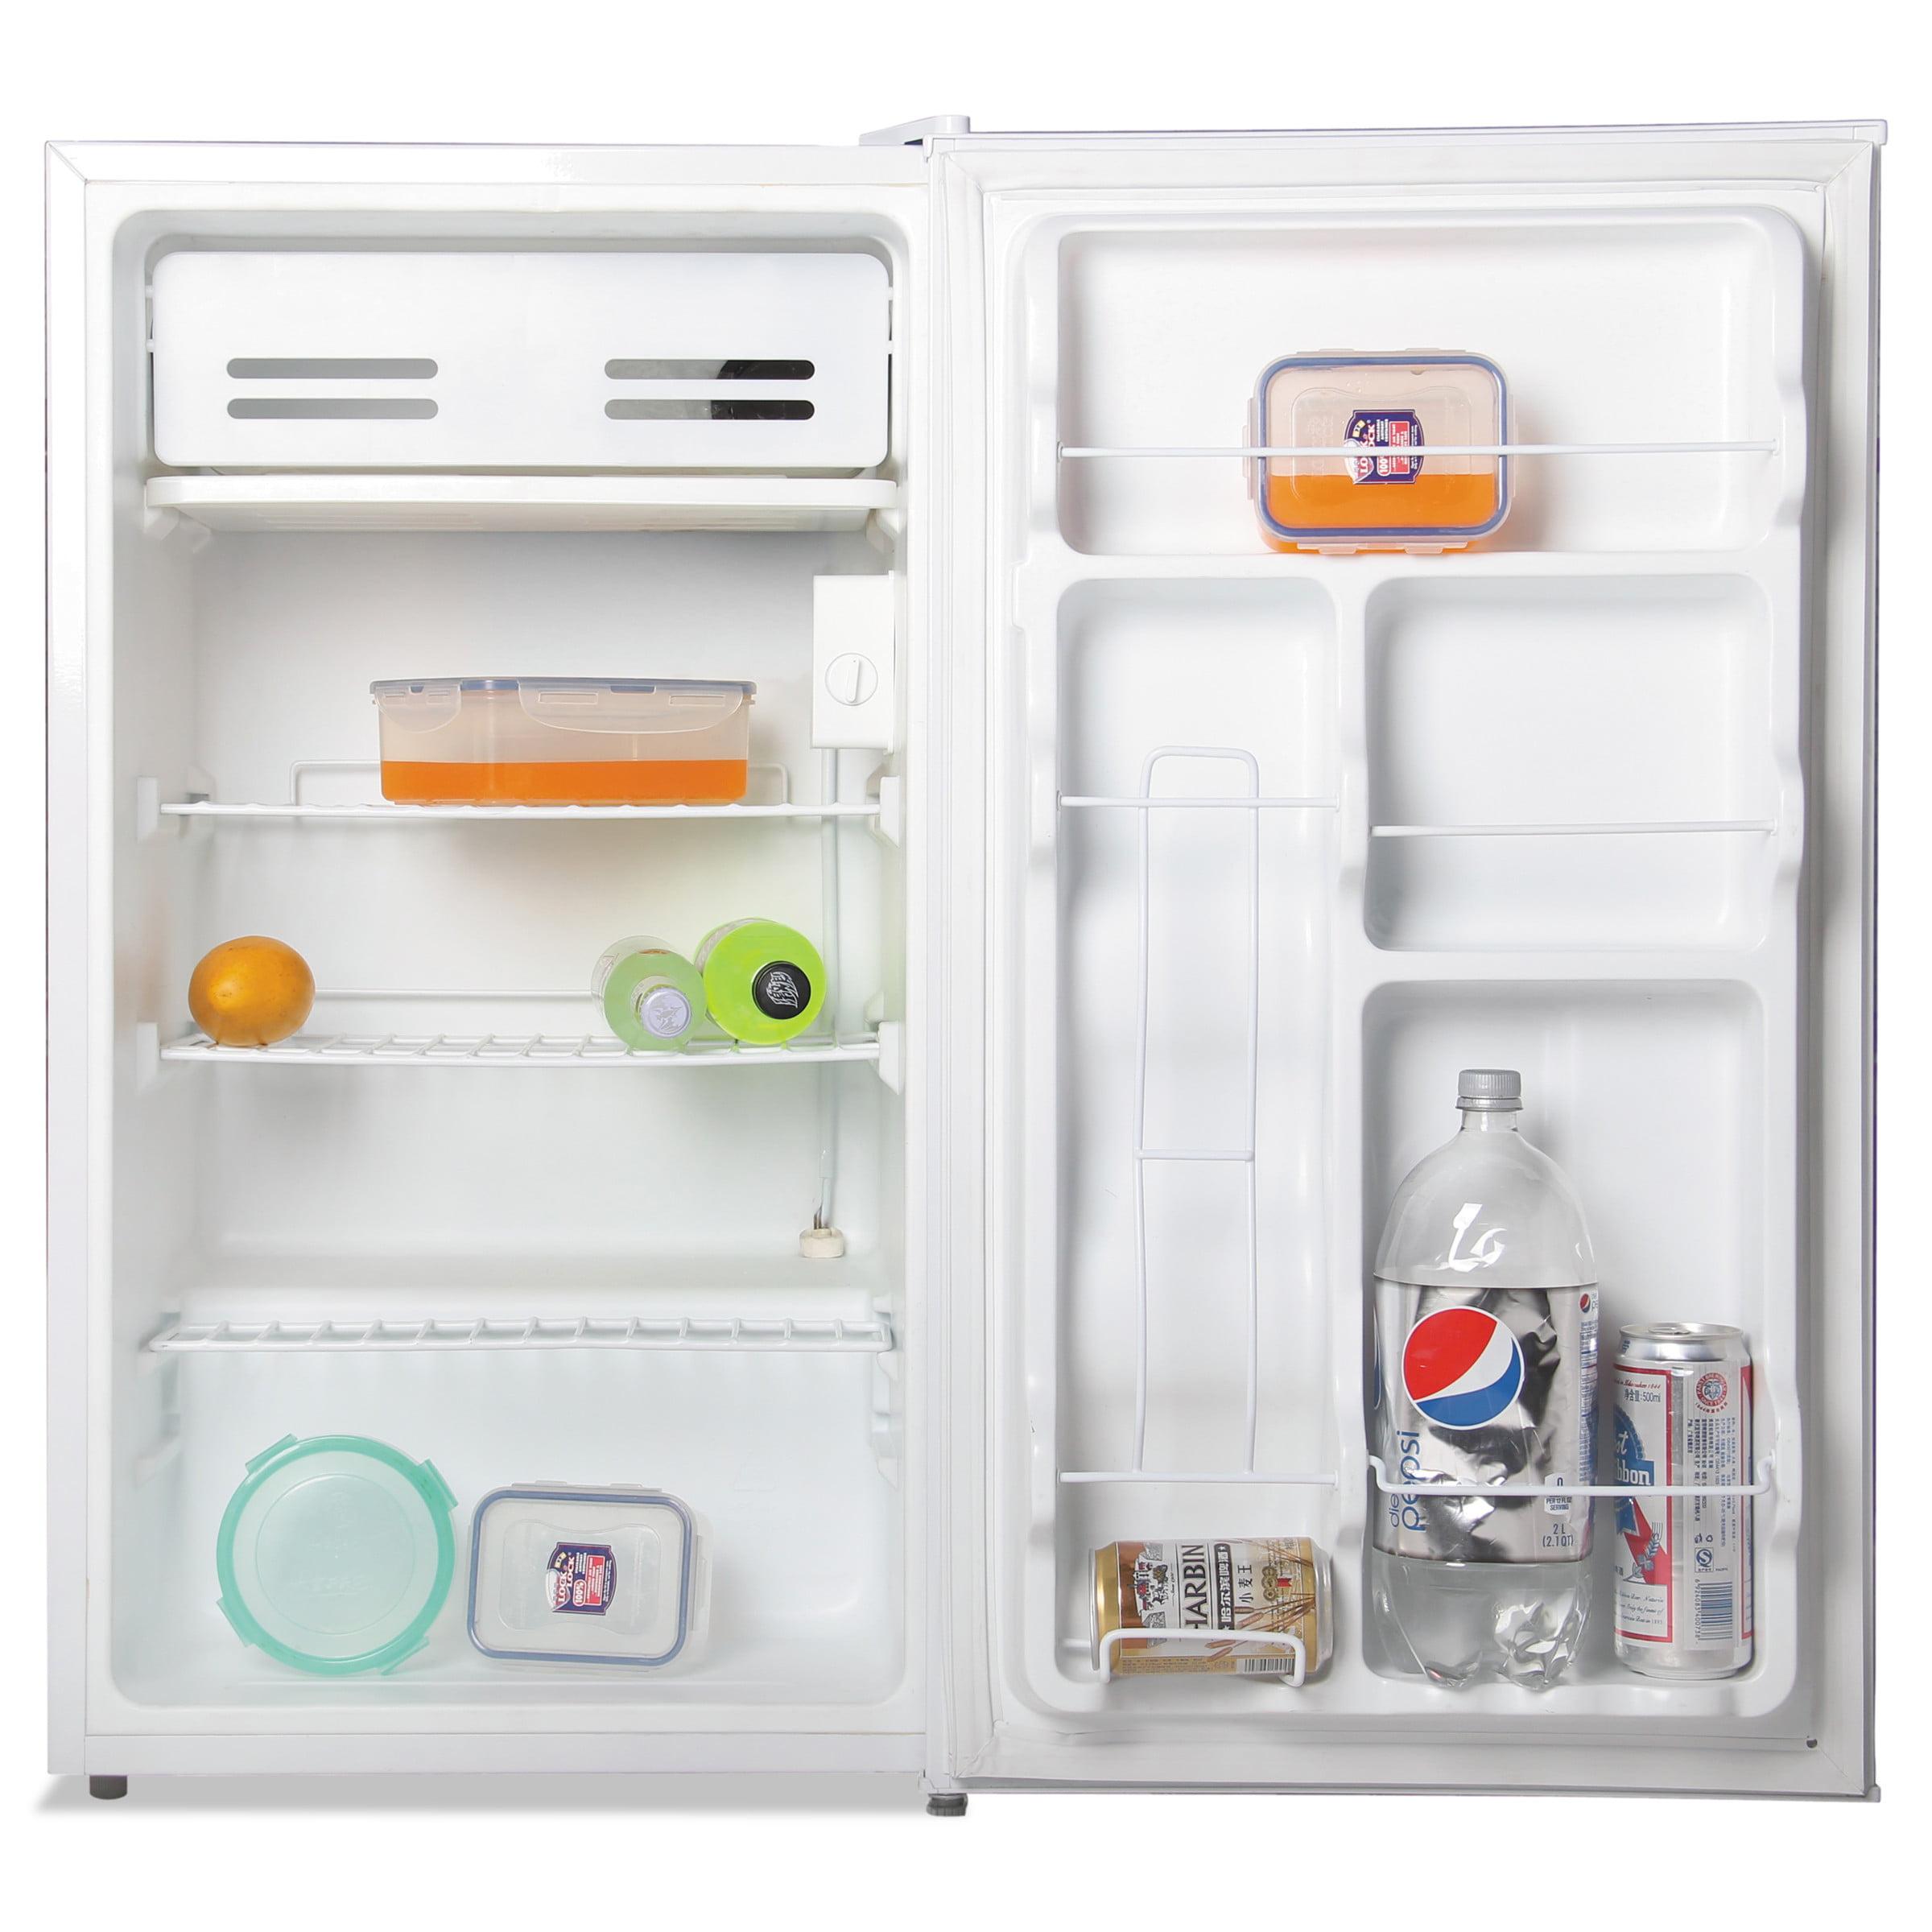 Alera 3.3 Cu. Ft. Refrigerator with Chiller Compartment, White